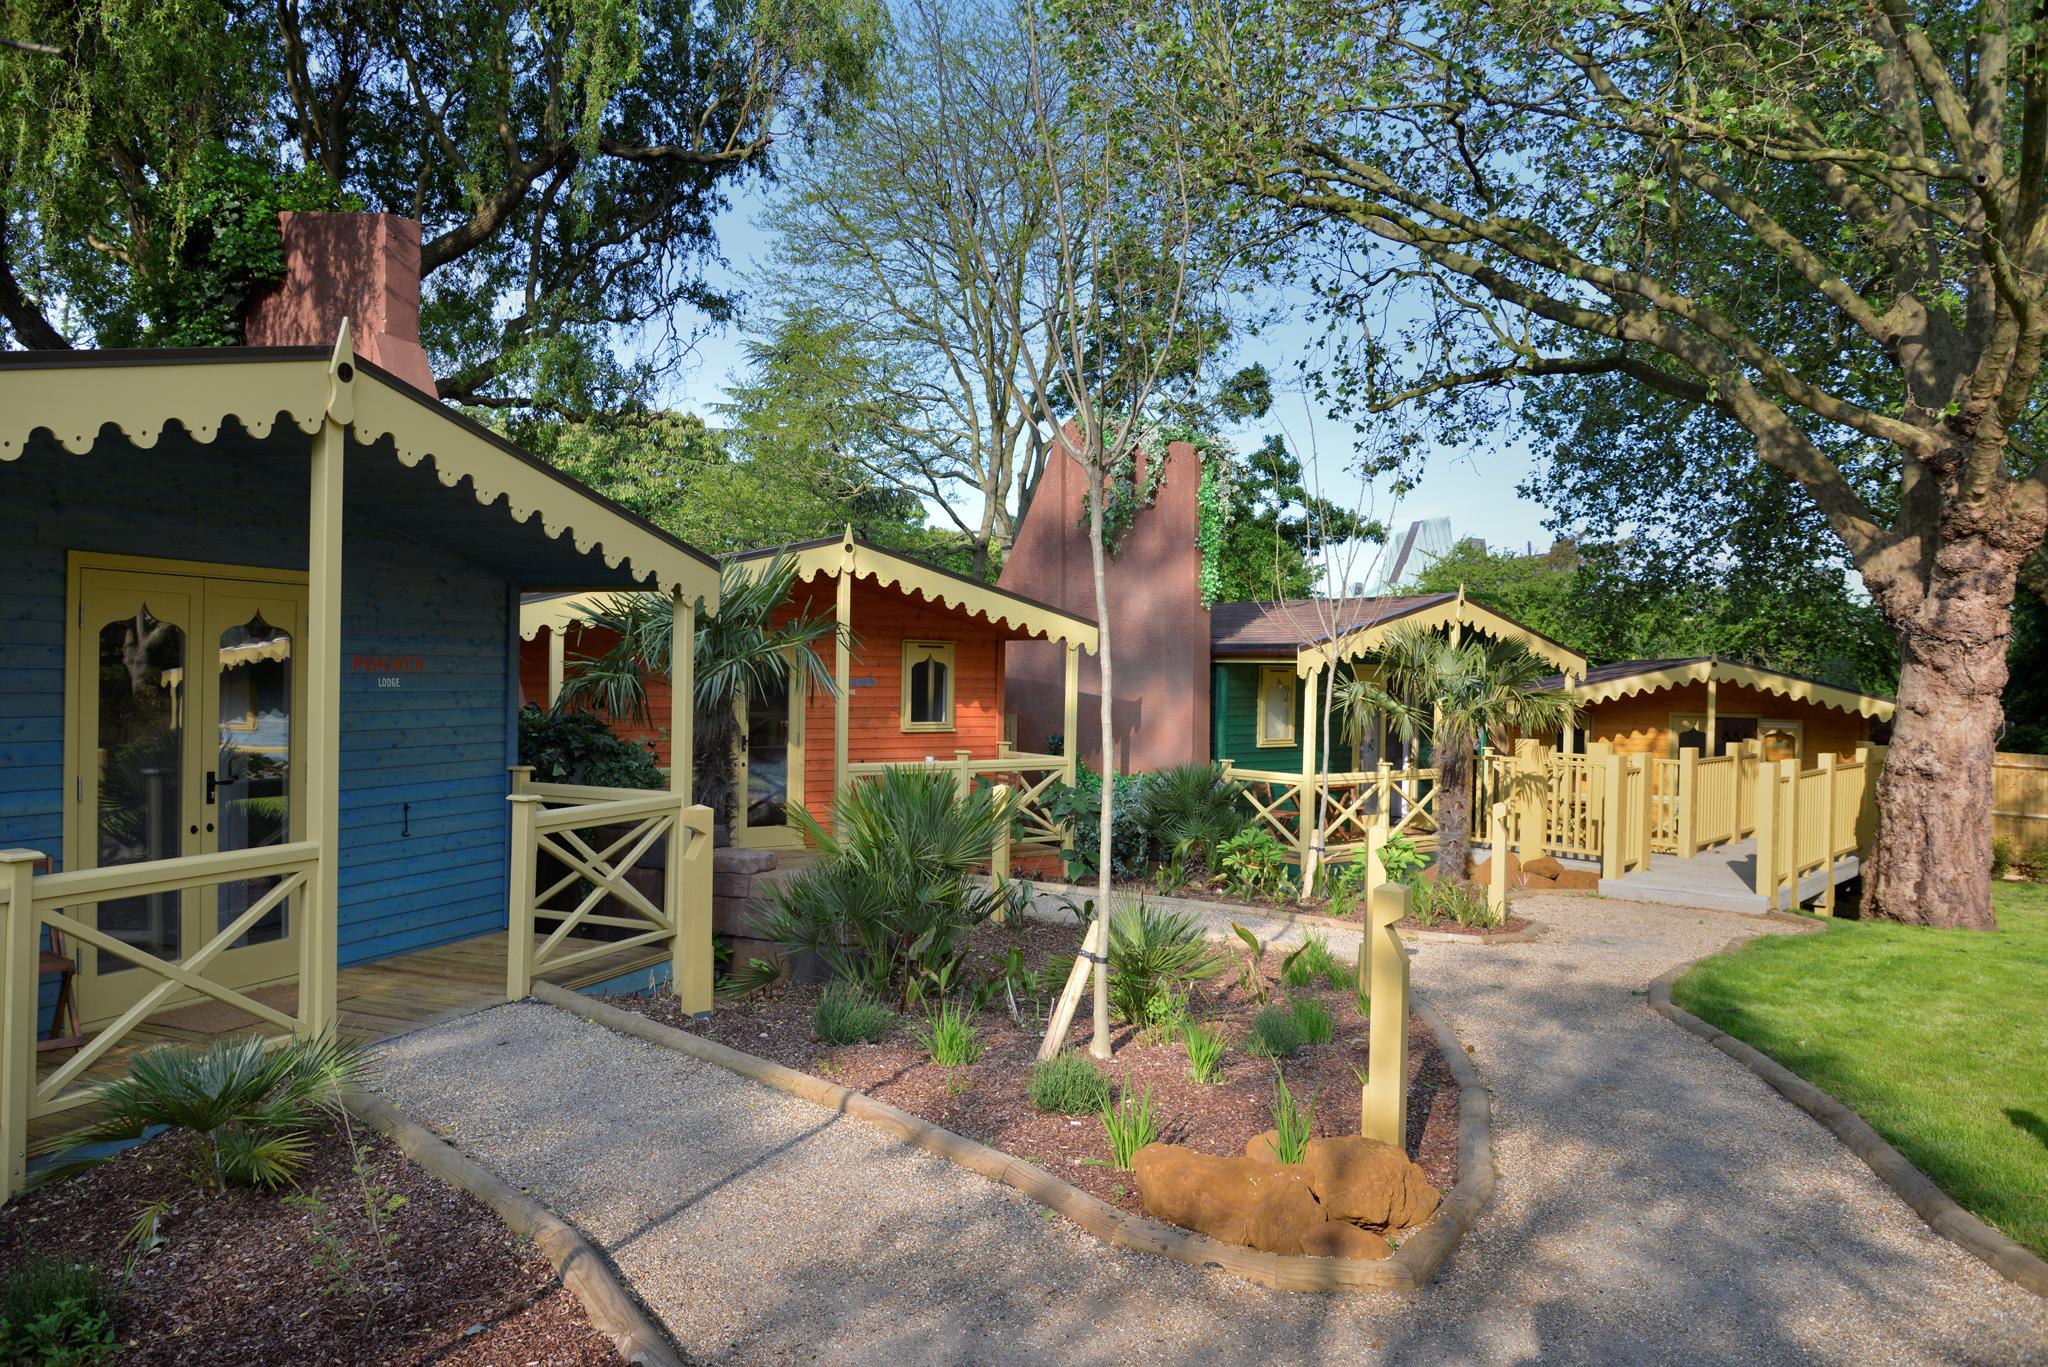 Gir Lion Lodge accommodation at London Zoo